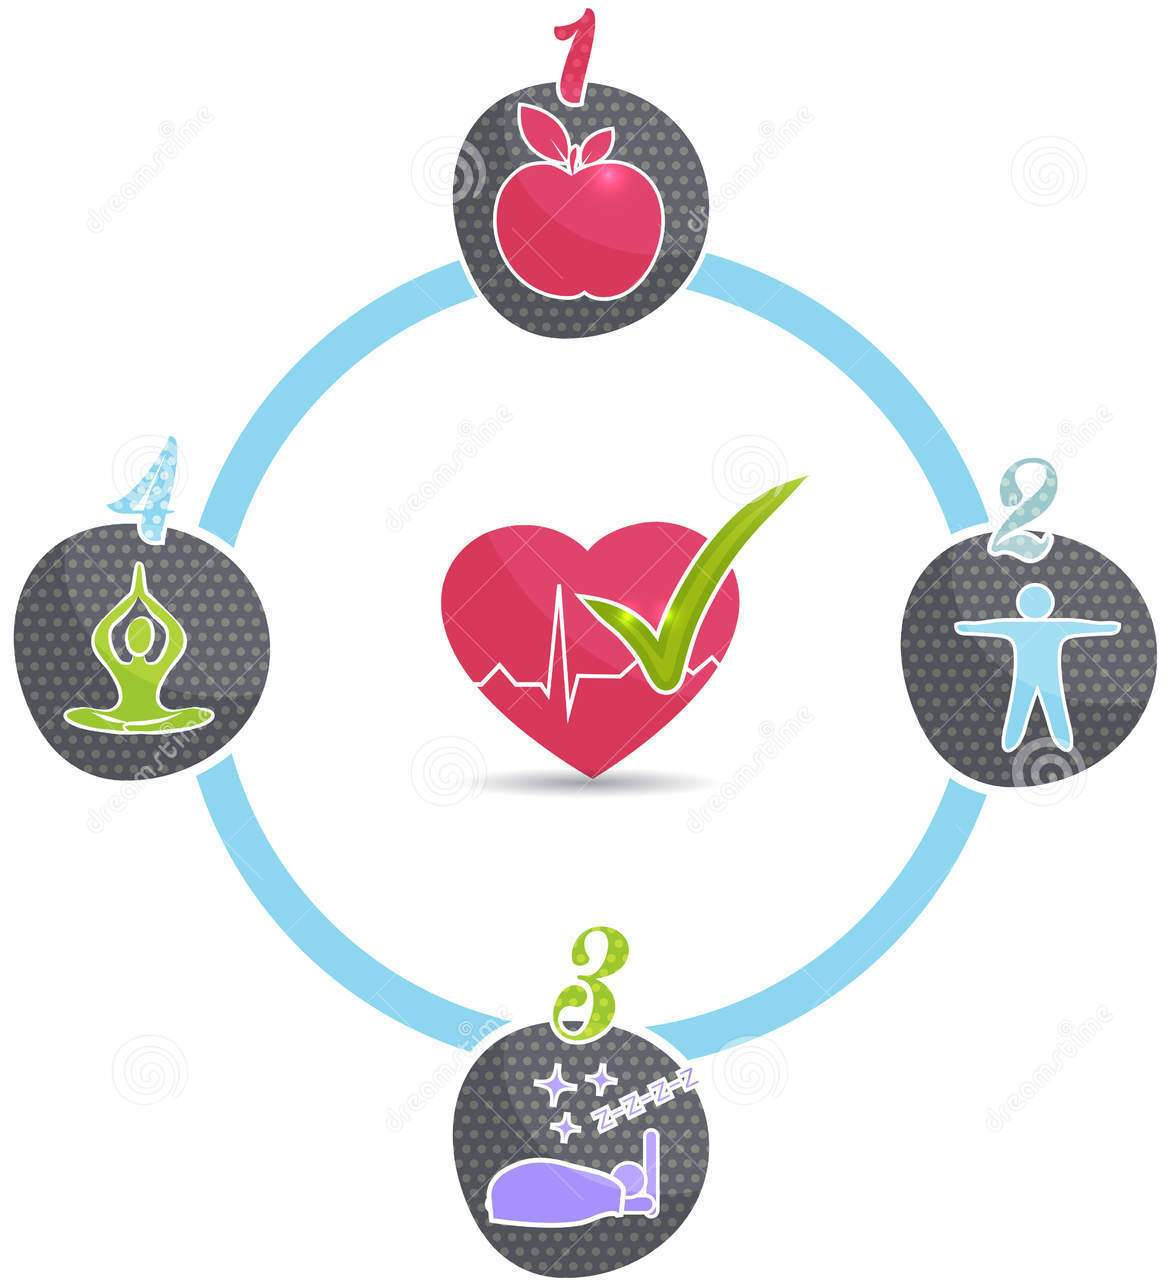 healthy-lifestyle-wheel-good-sleep-fitness-food-stress-management-leads-to-heart-life-33083198.jpg